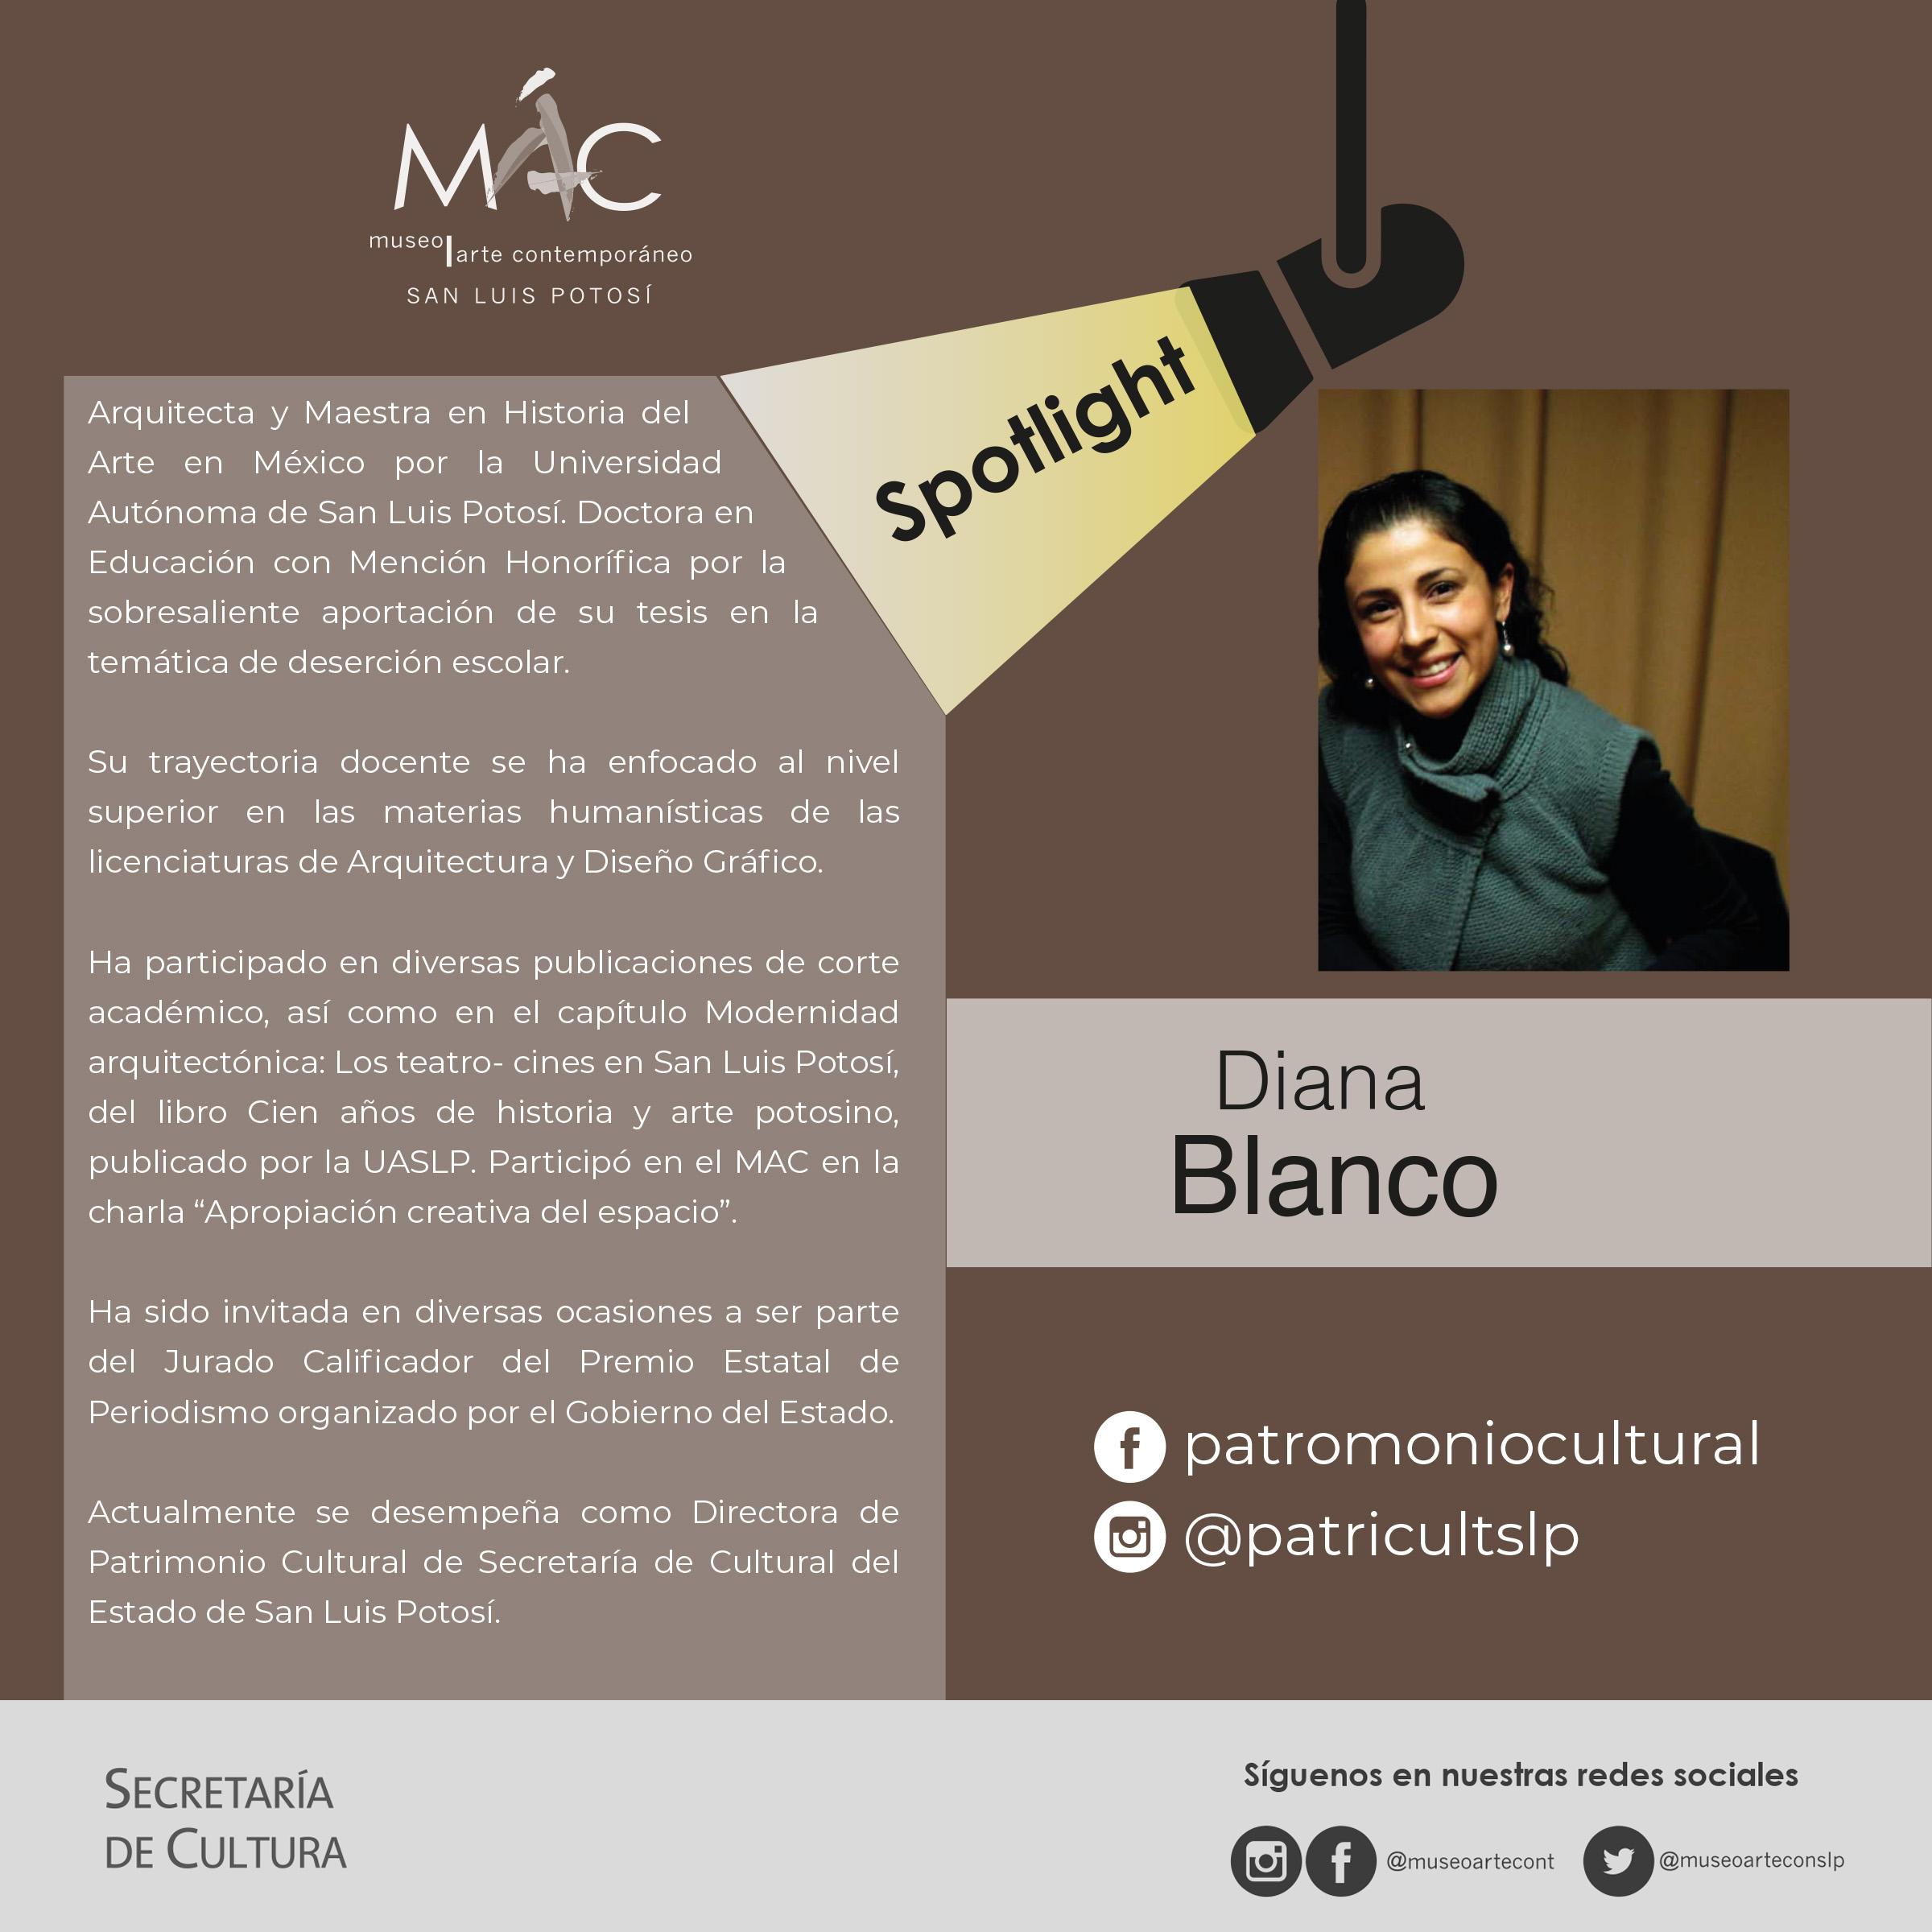 diana_blanco